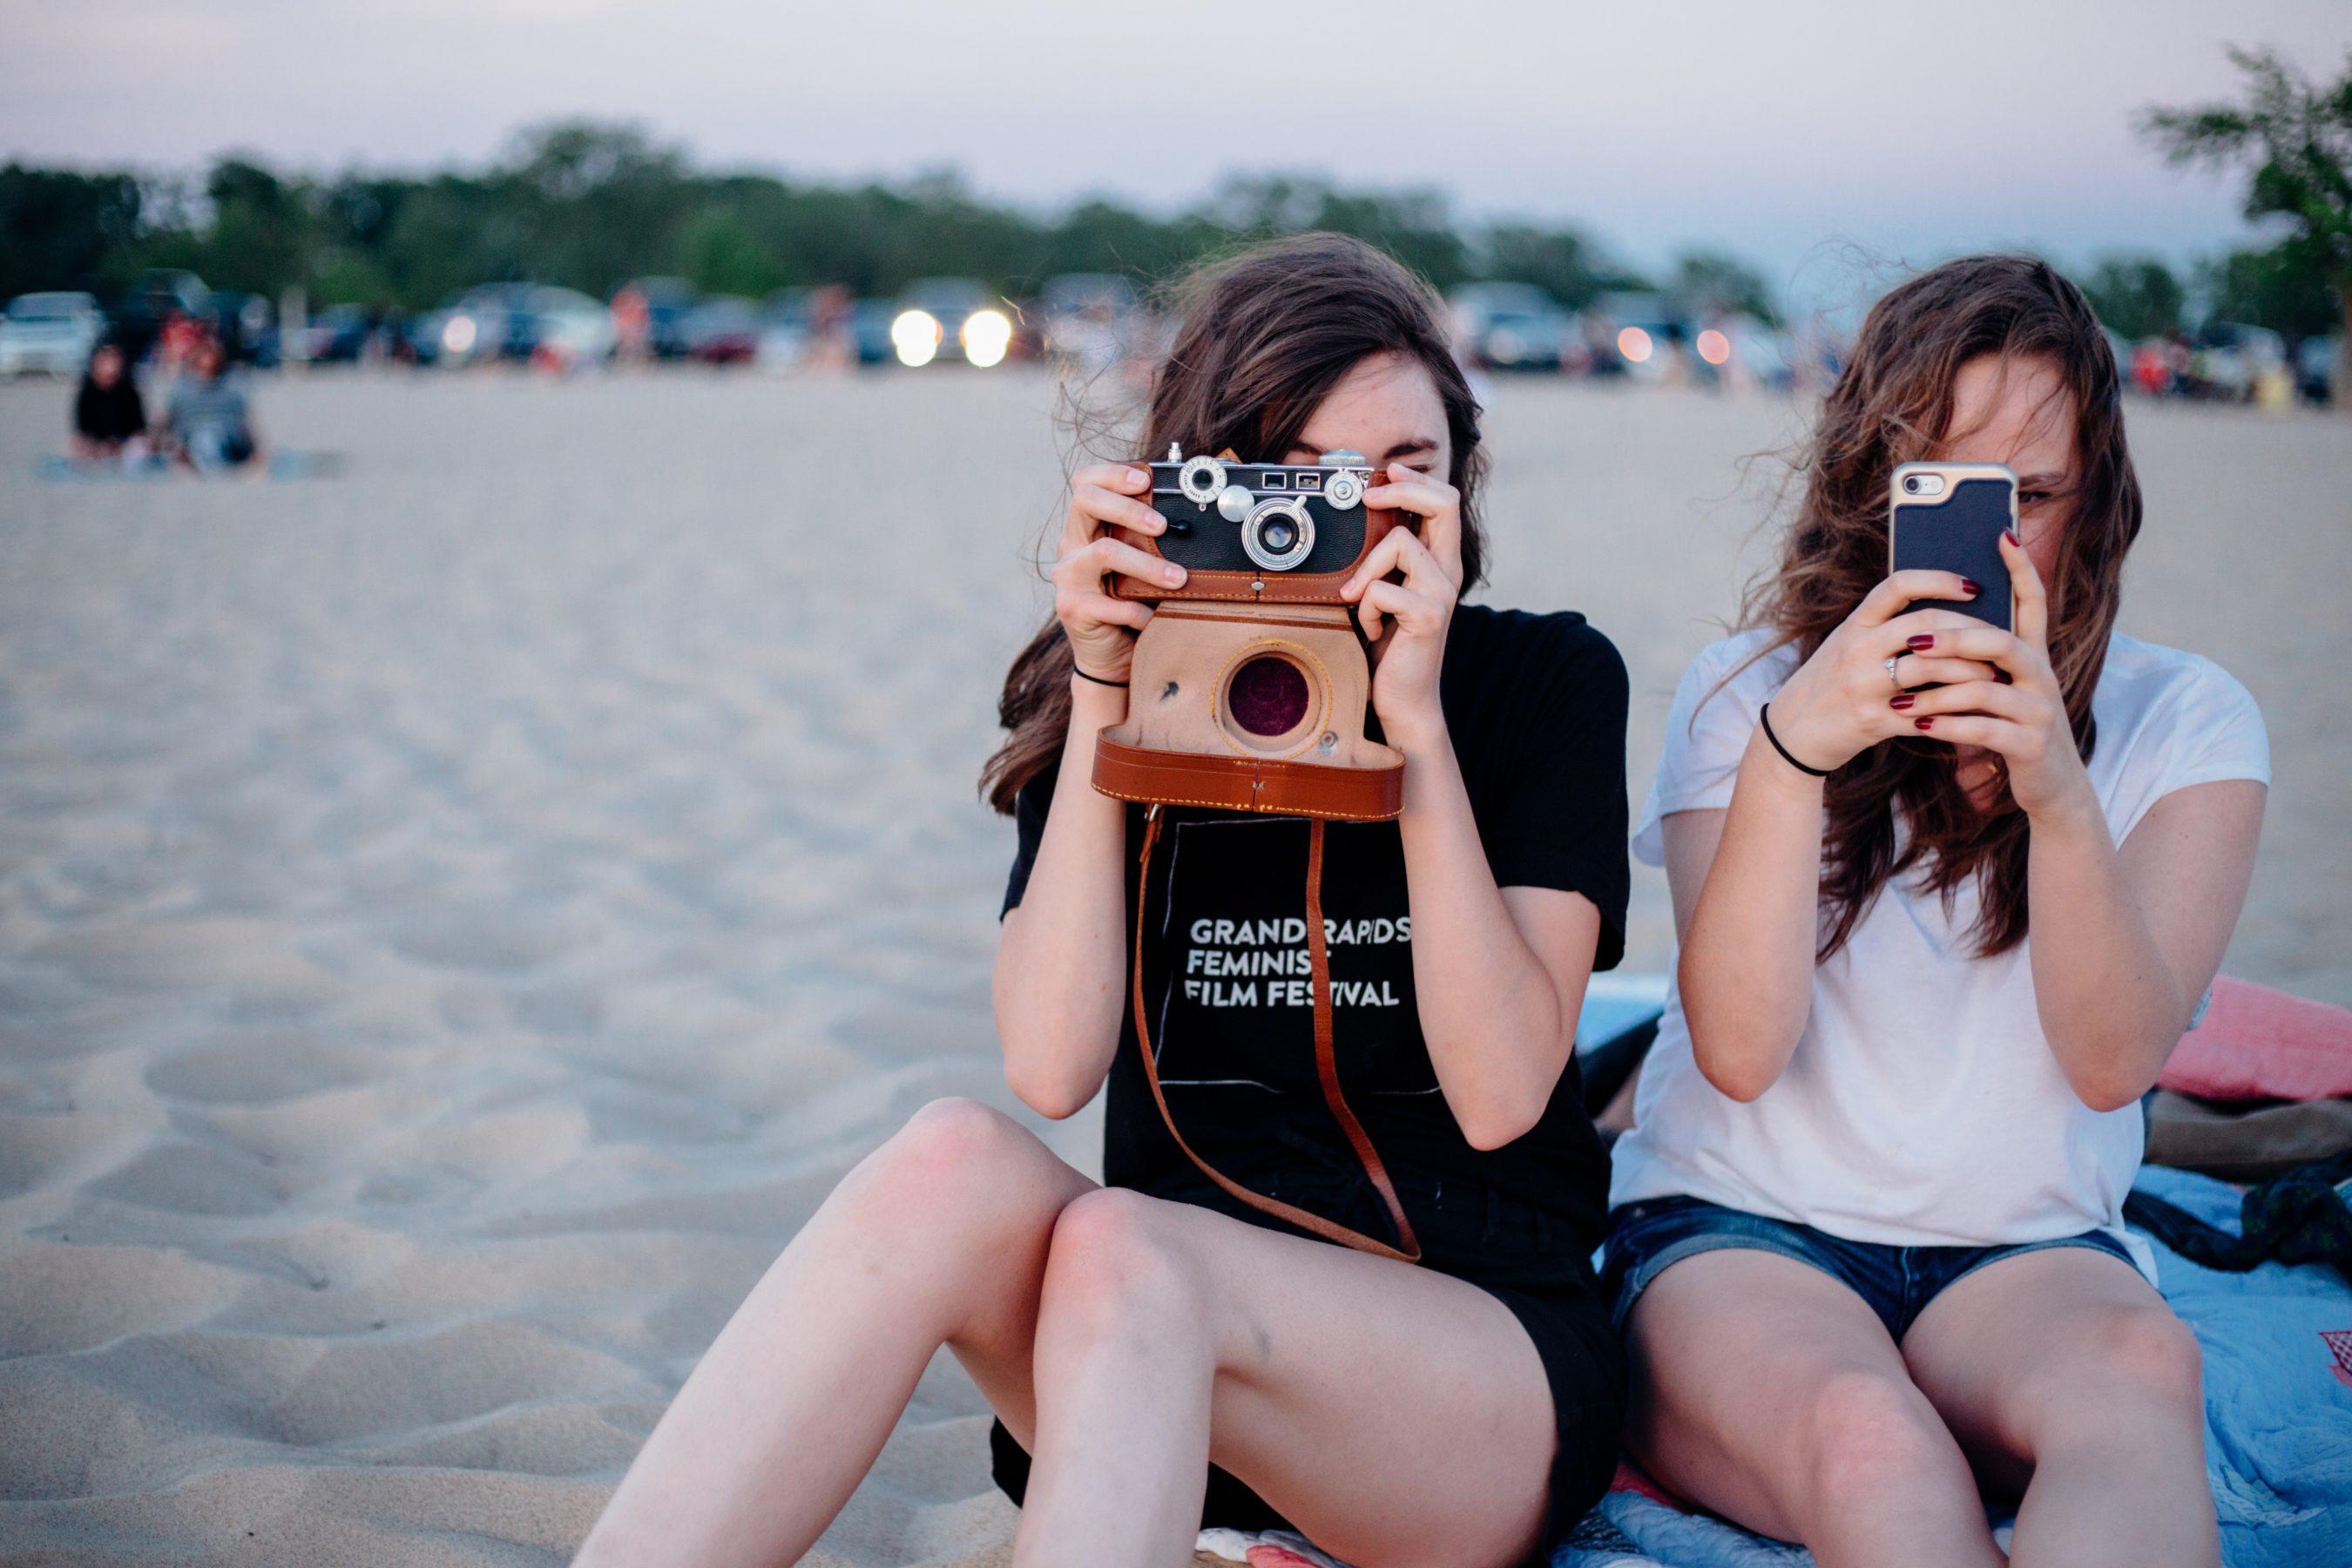 Fotocommunity, Reviews, Tests, Bilddiskussionen, Fotowettbewerbe u.v.m. - ob Smartphone, Vollformat oder Mittelformat.